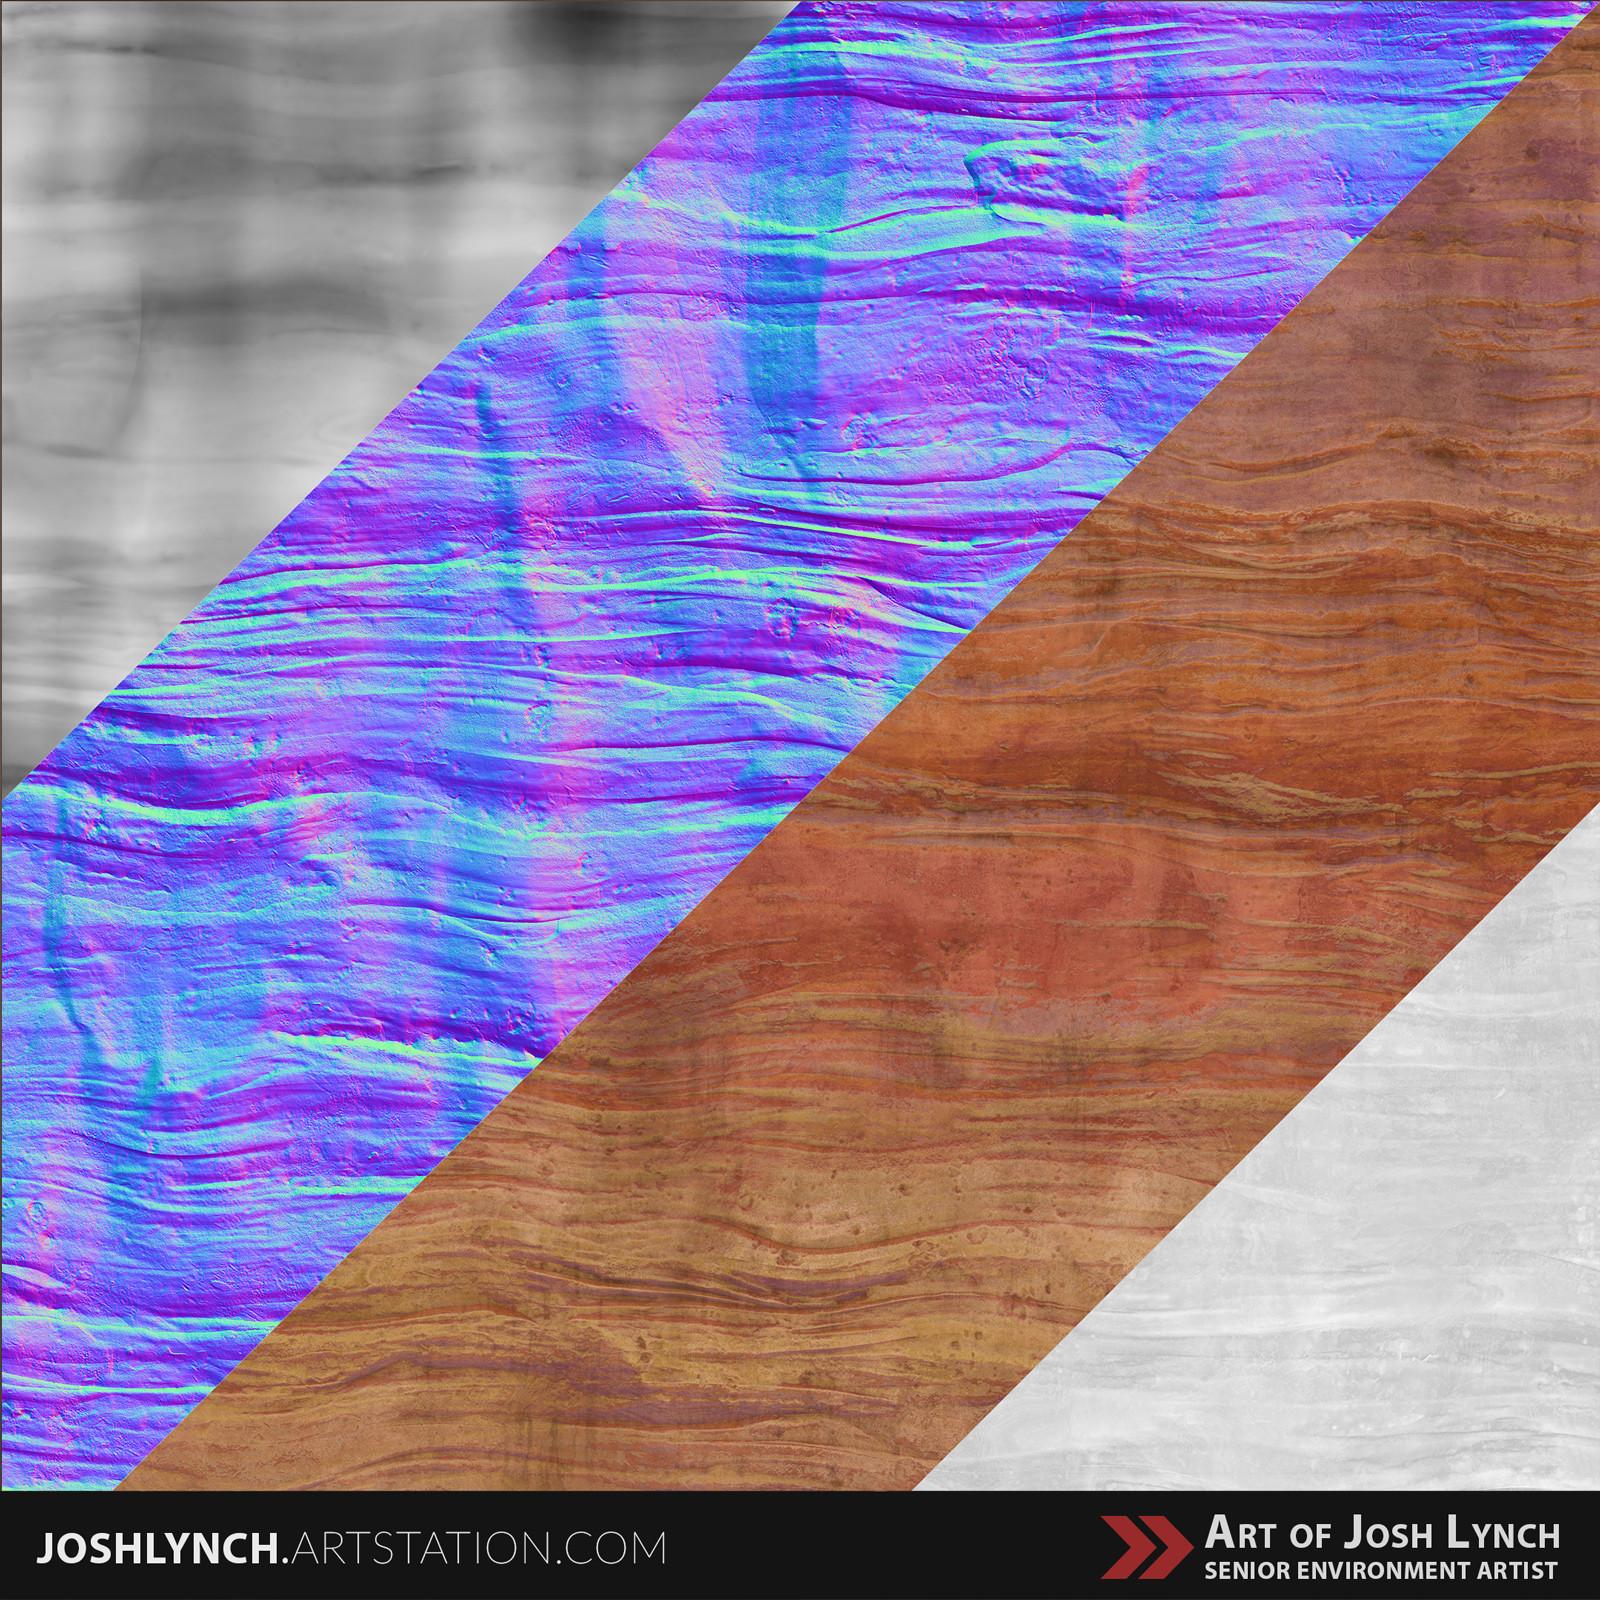 Joshua lynch rock wall 03 layout comp sqyare textures